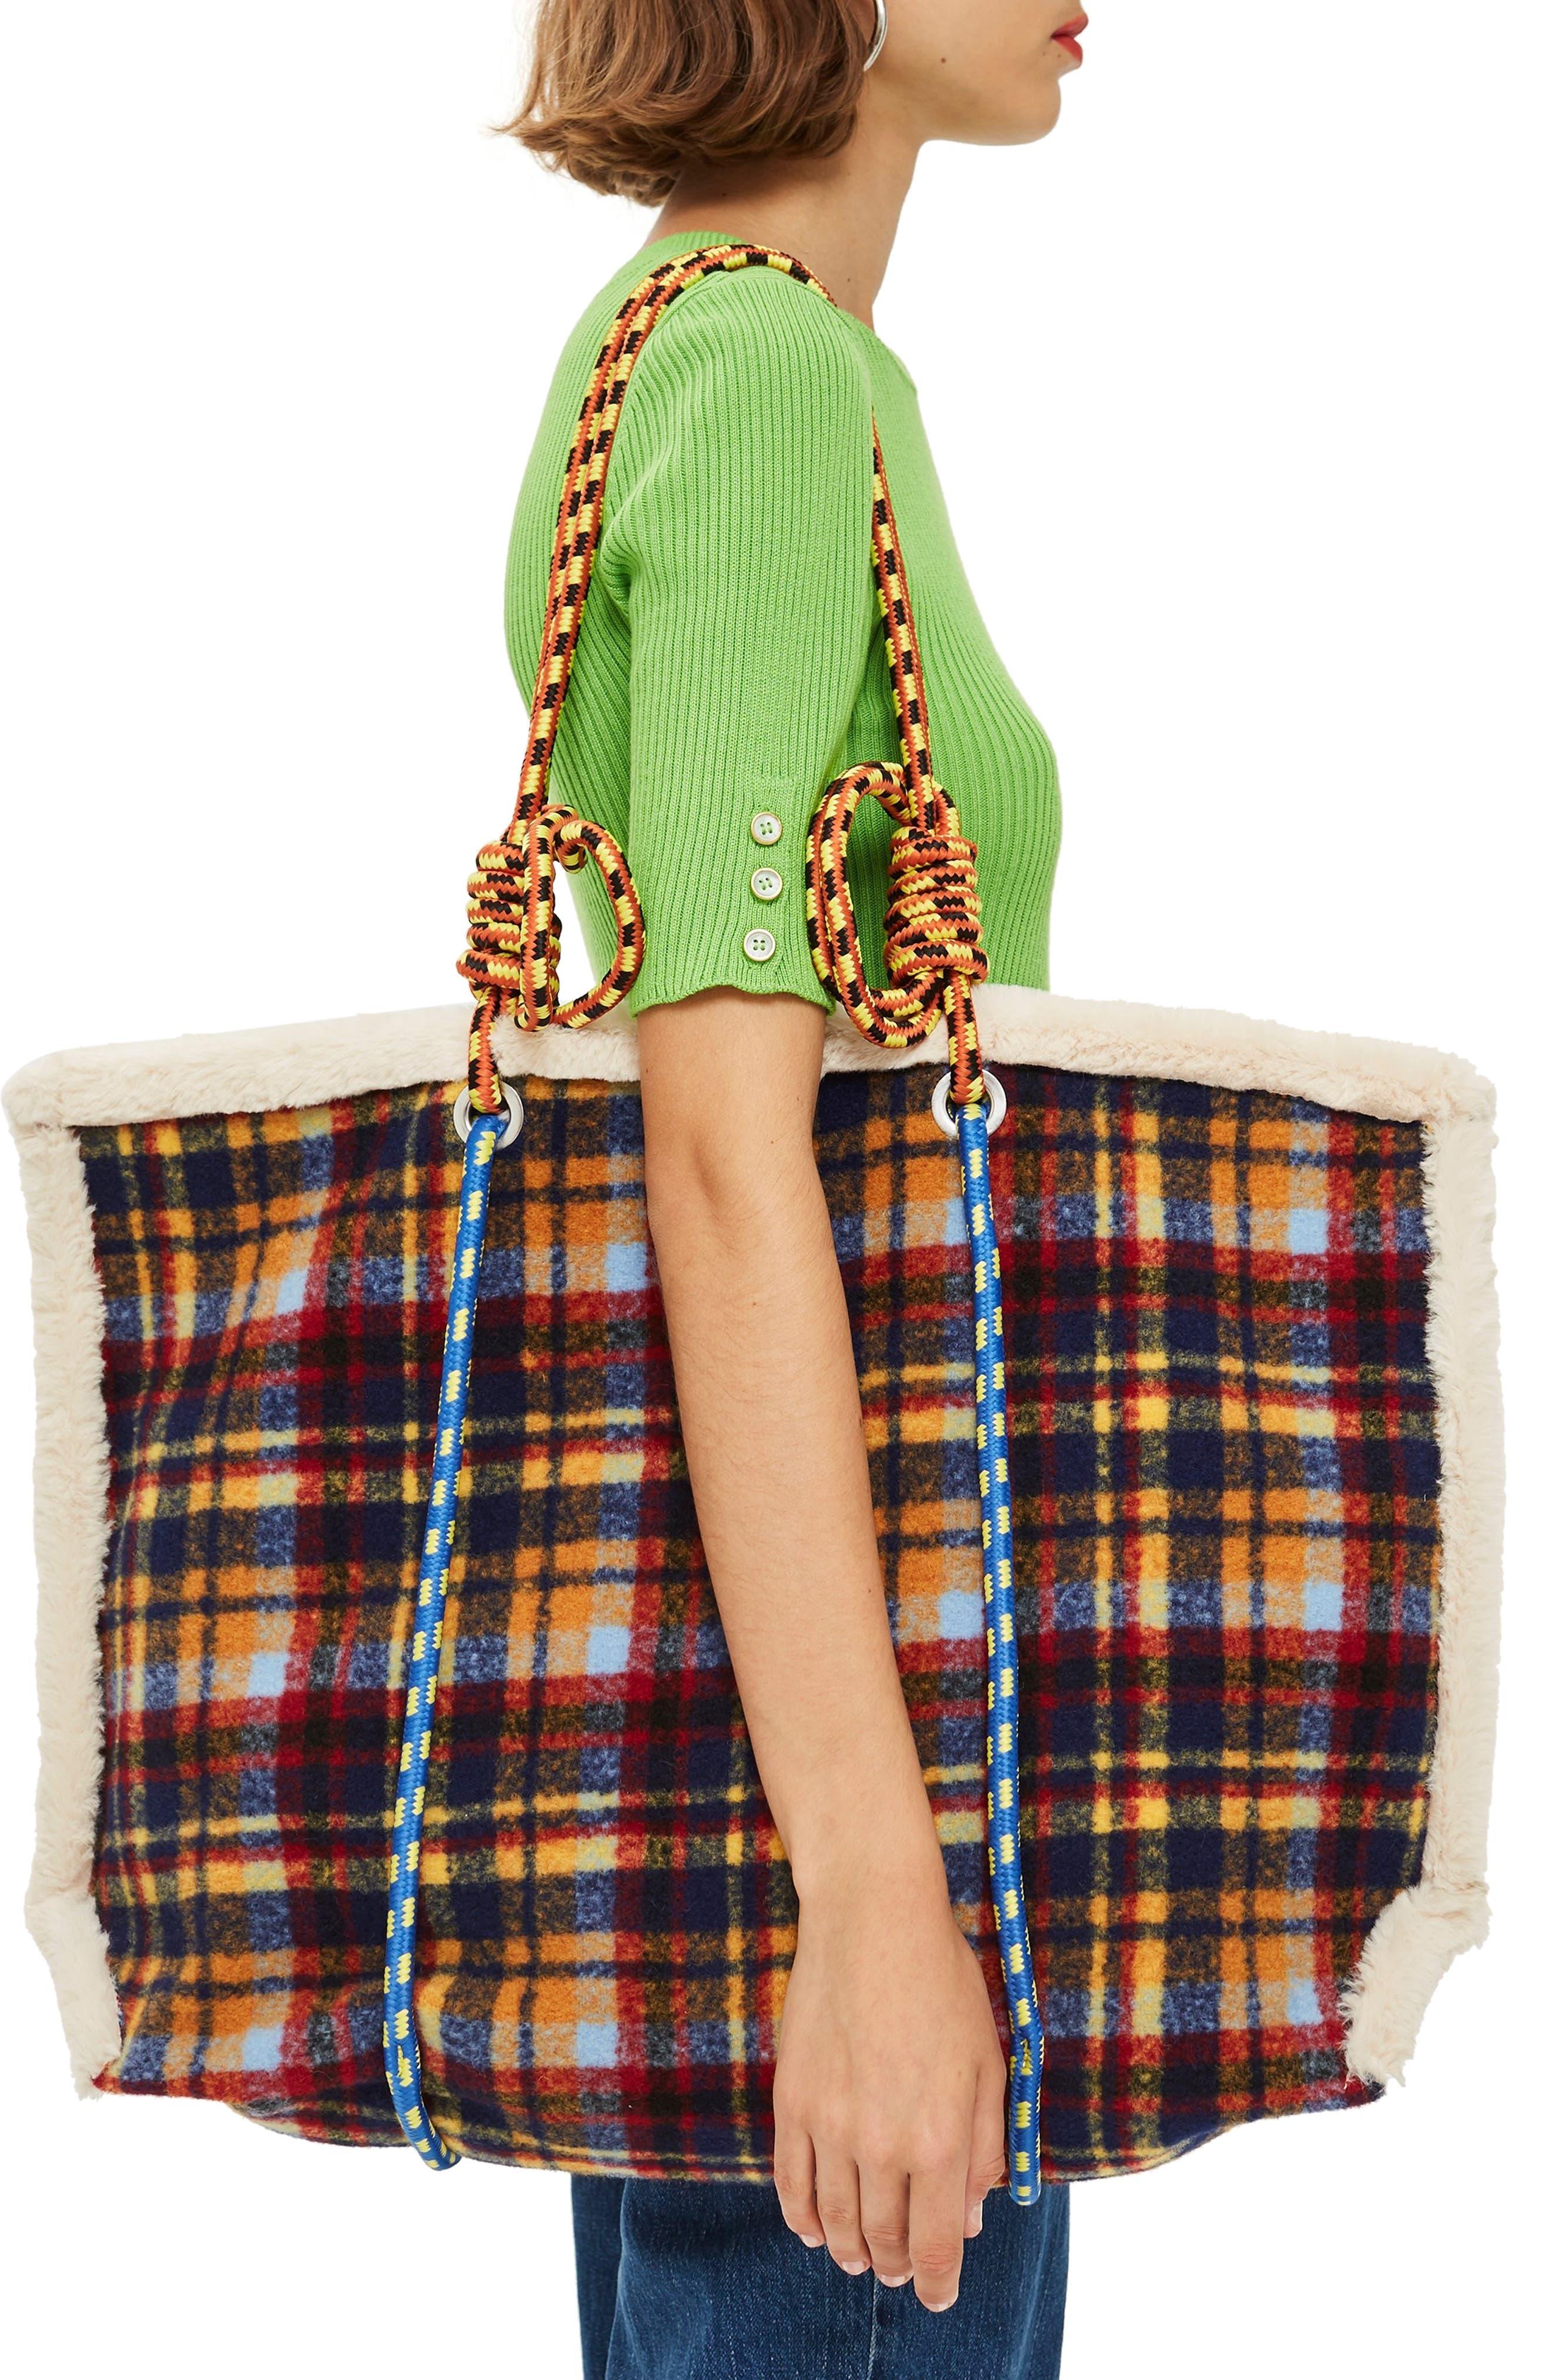 Blanket Rope Tote Bag,                             Alternate thumbnail 2, color,                             BLUE MULTI